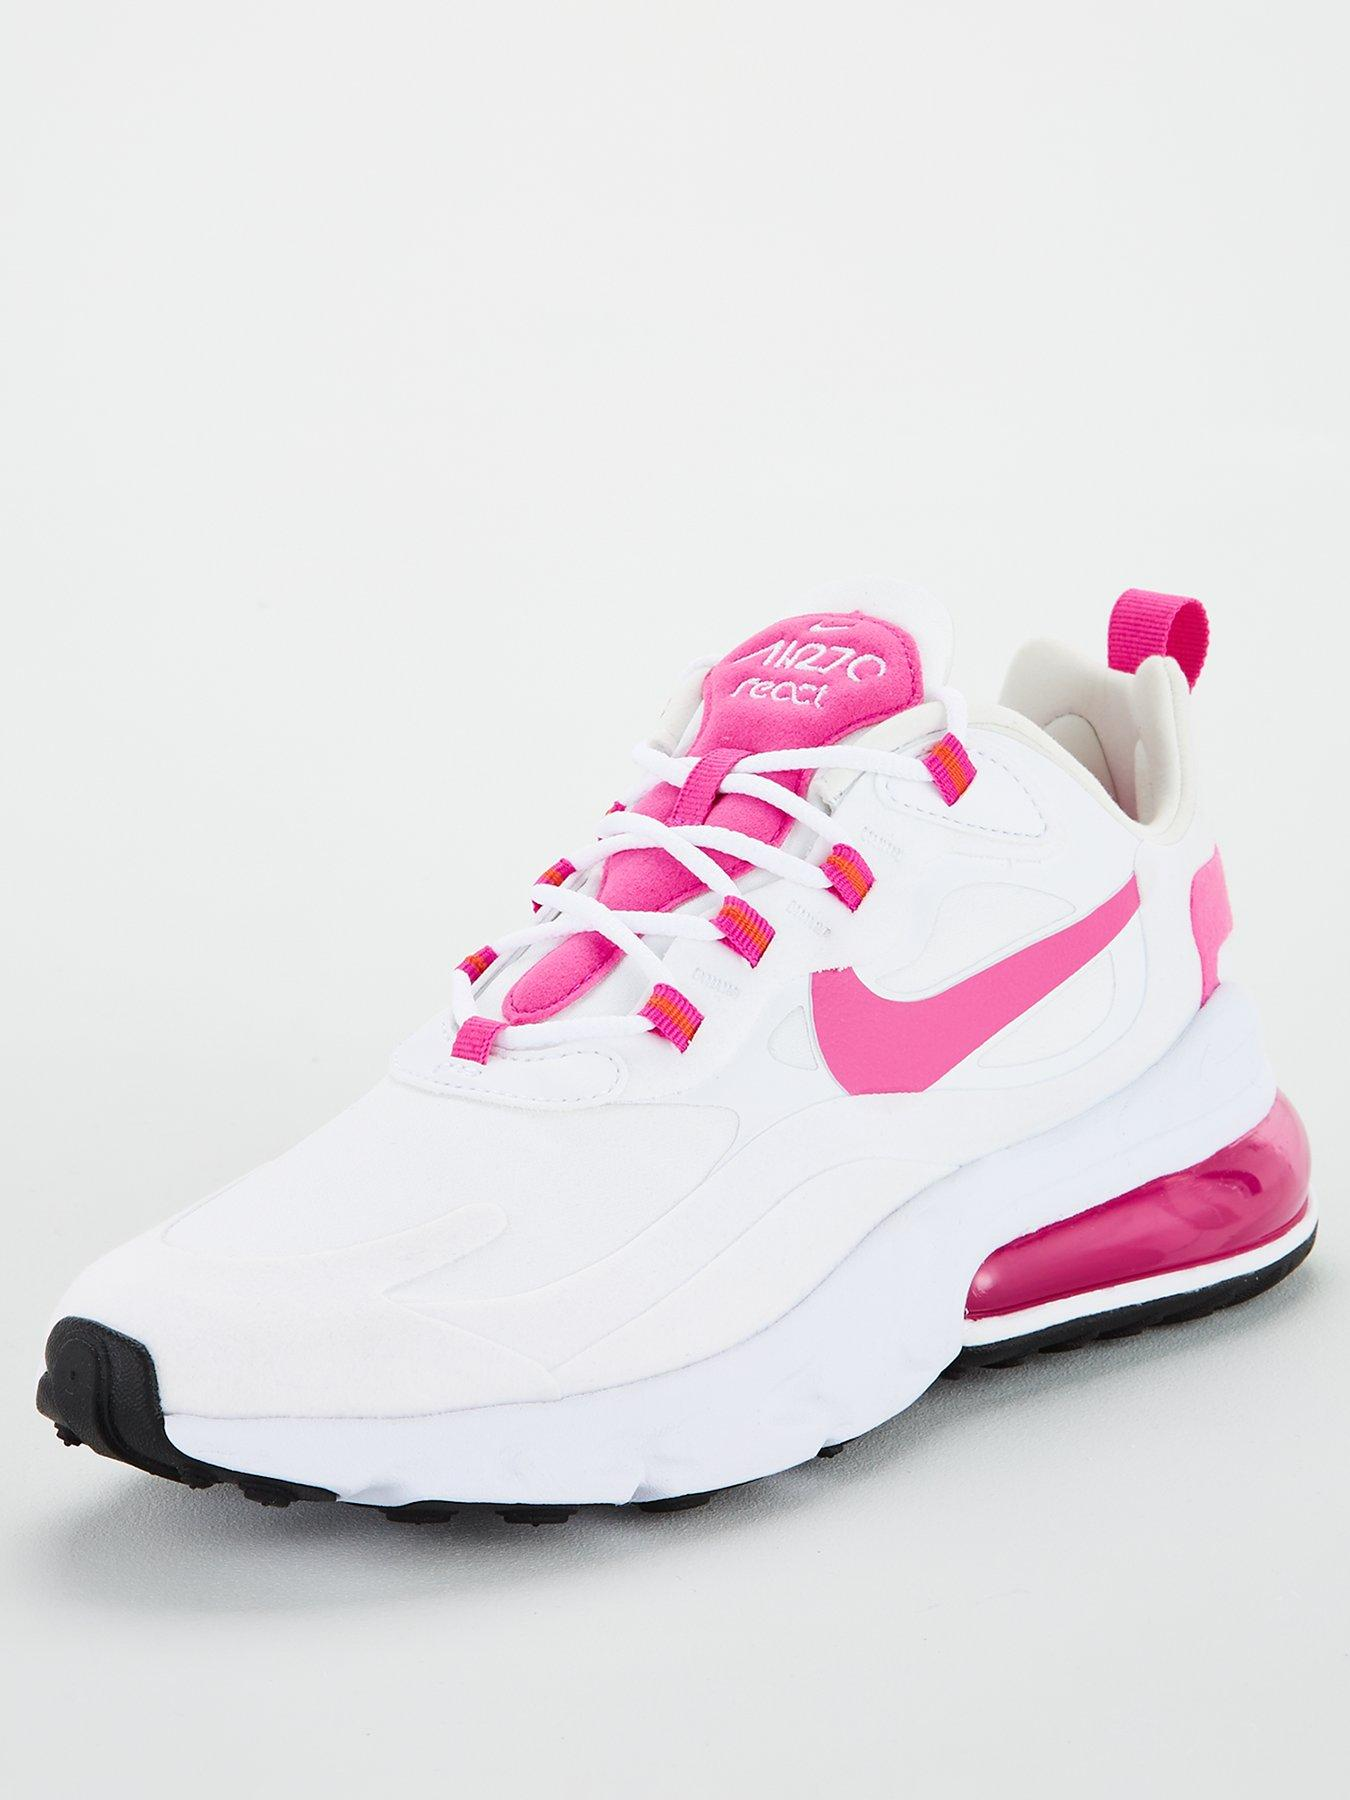 Nike Air Max 270 React - White/Pink